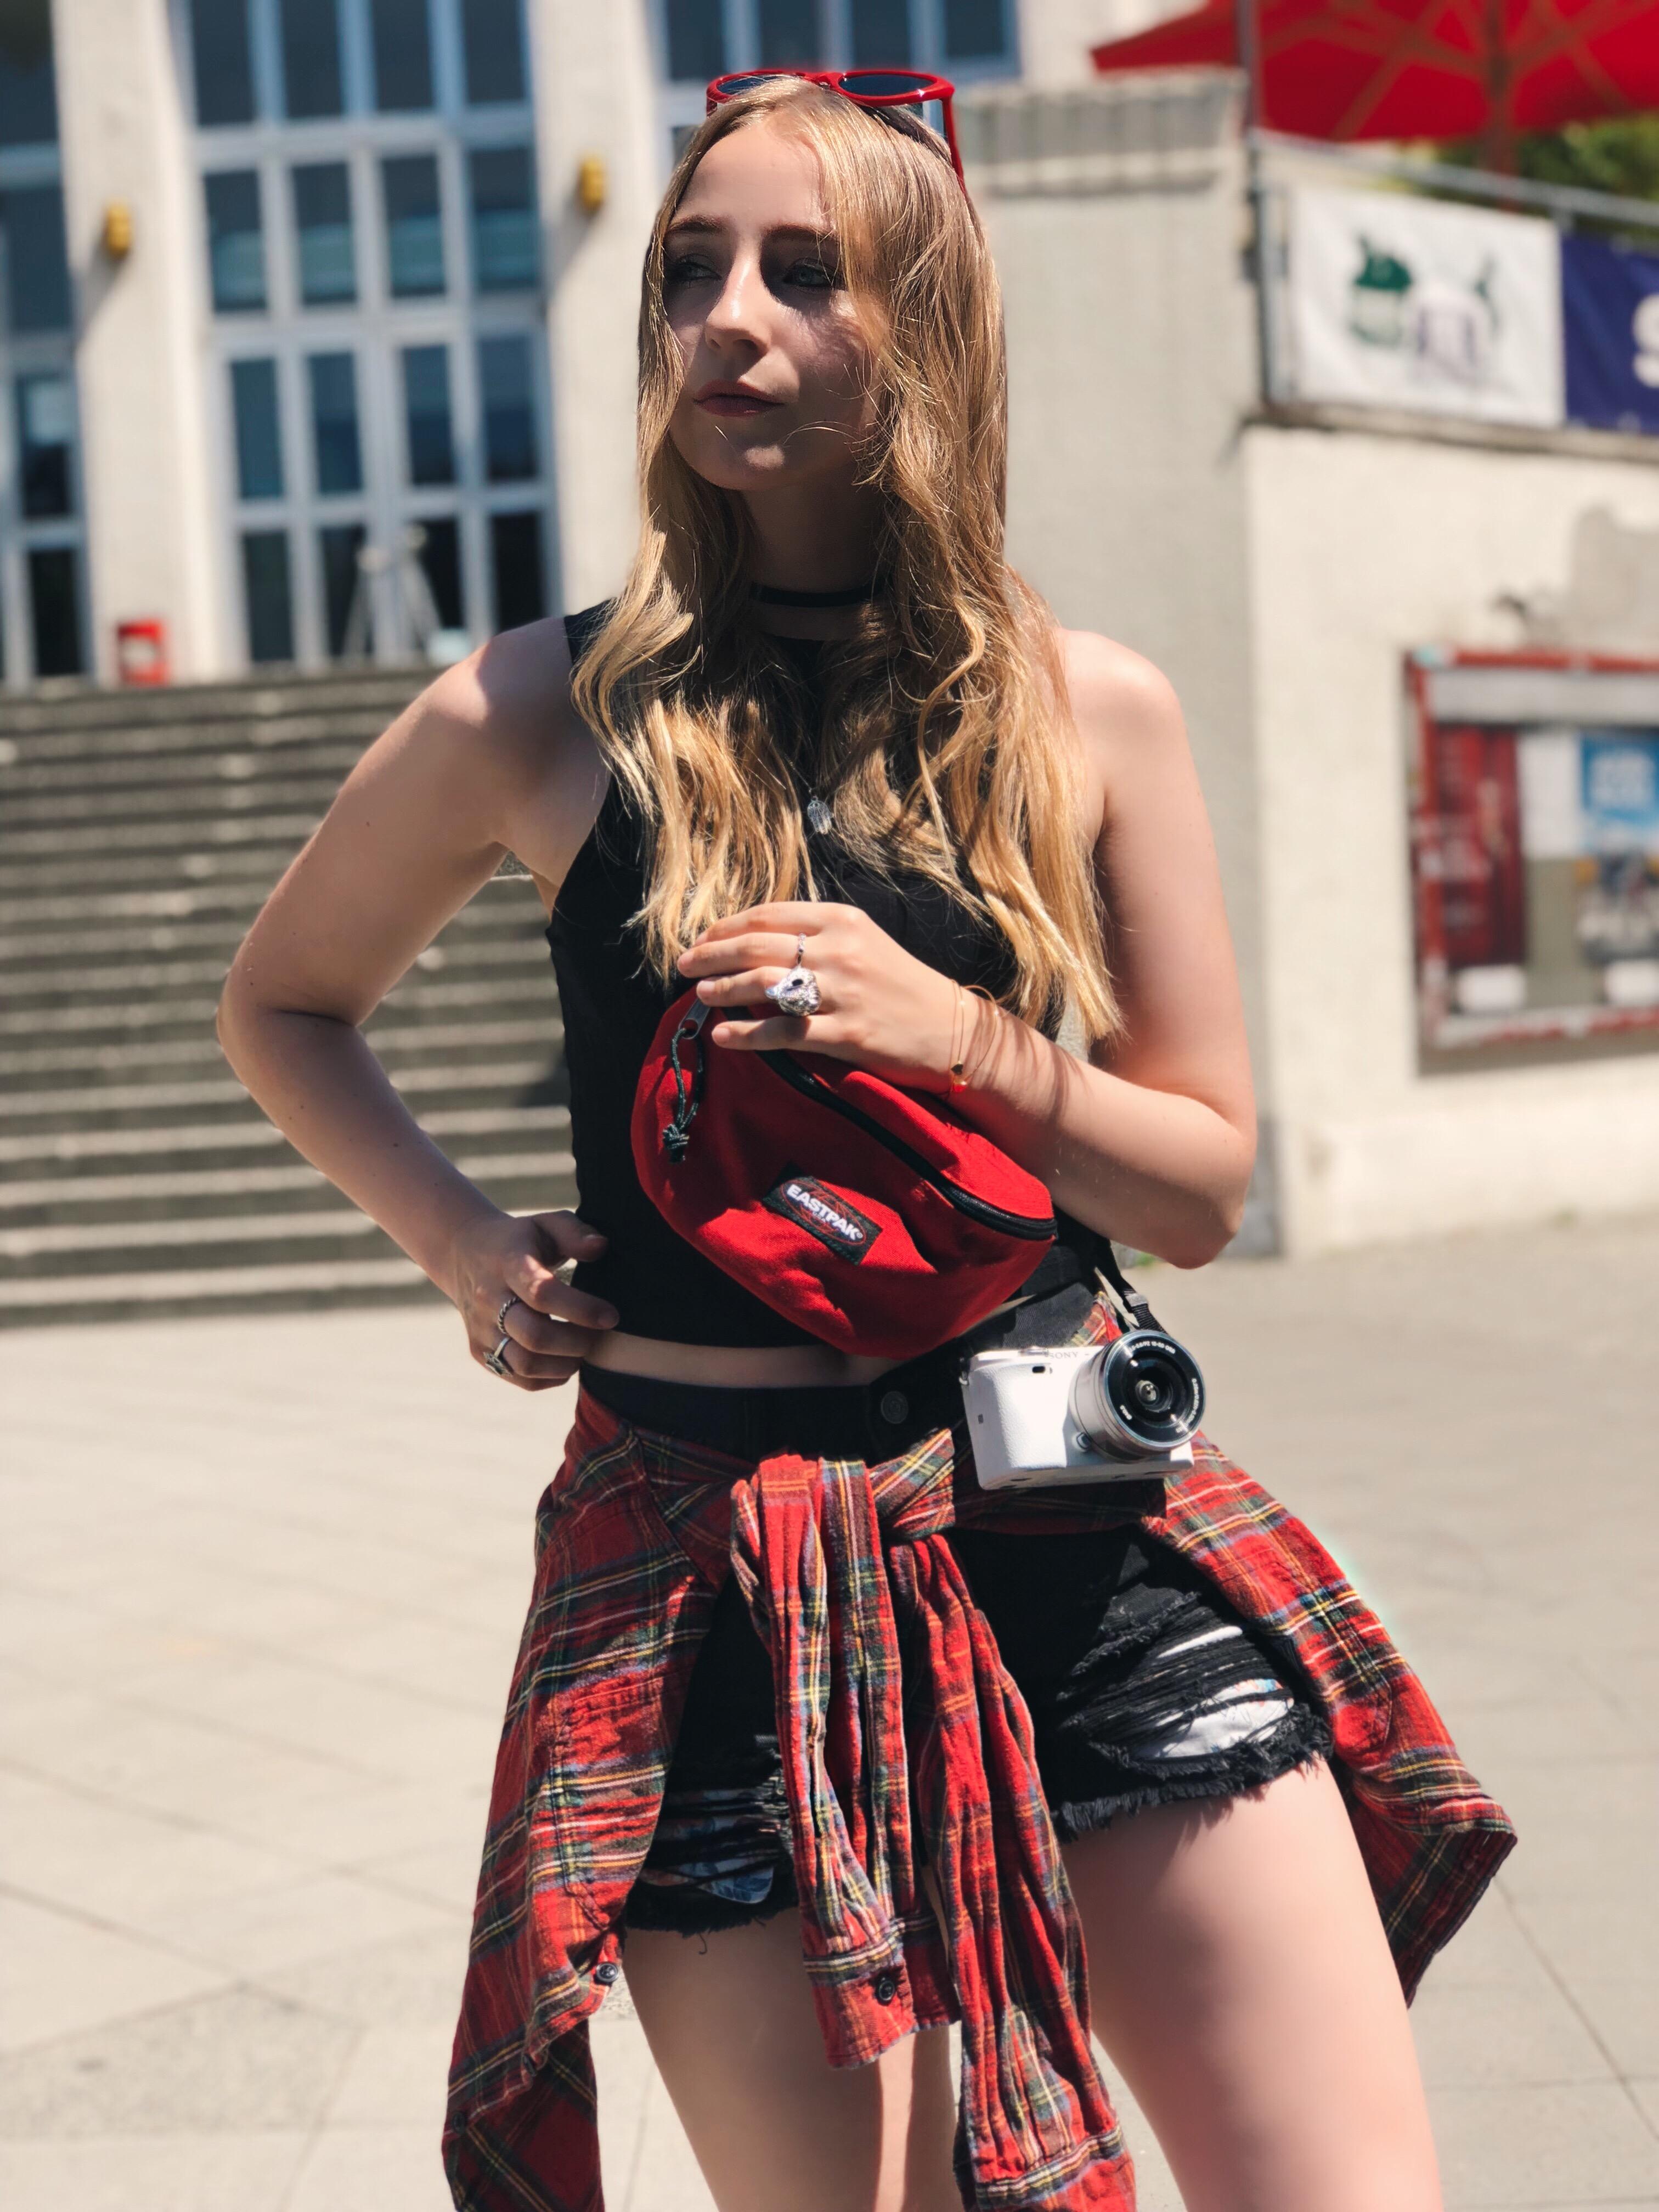 festival-outfit-style-festivalguide-berlin-hotpants-kariertes-hemd-retro-sonnenbrille